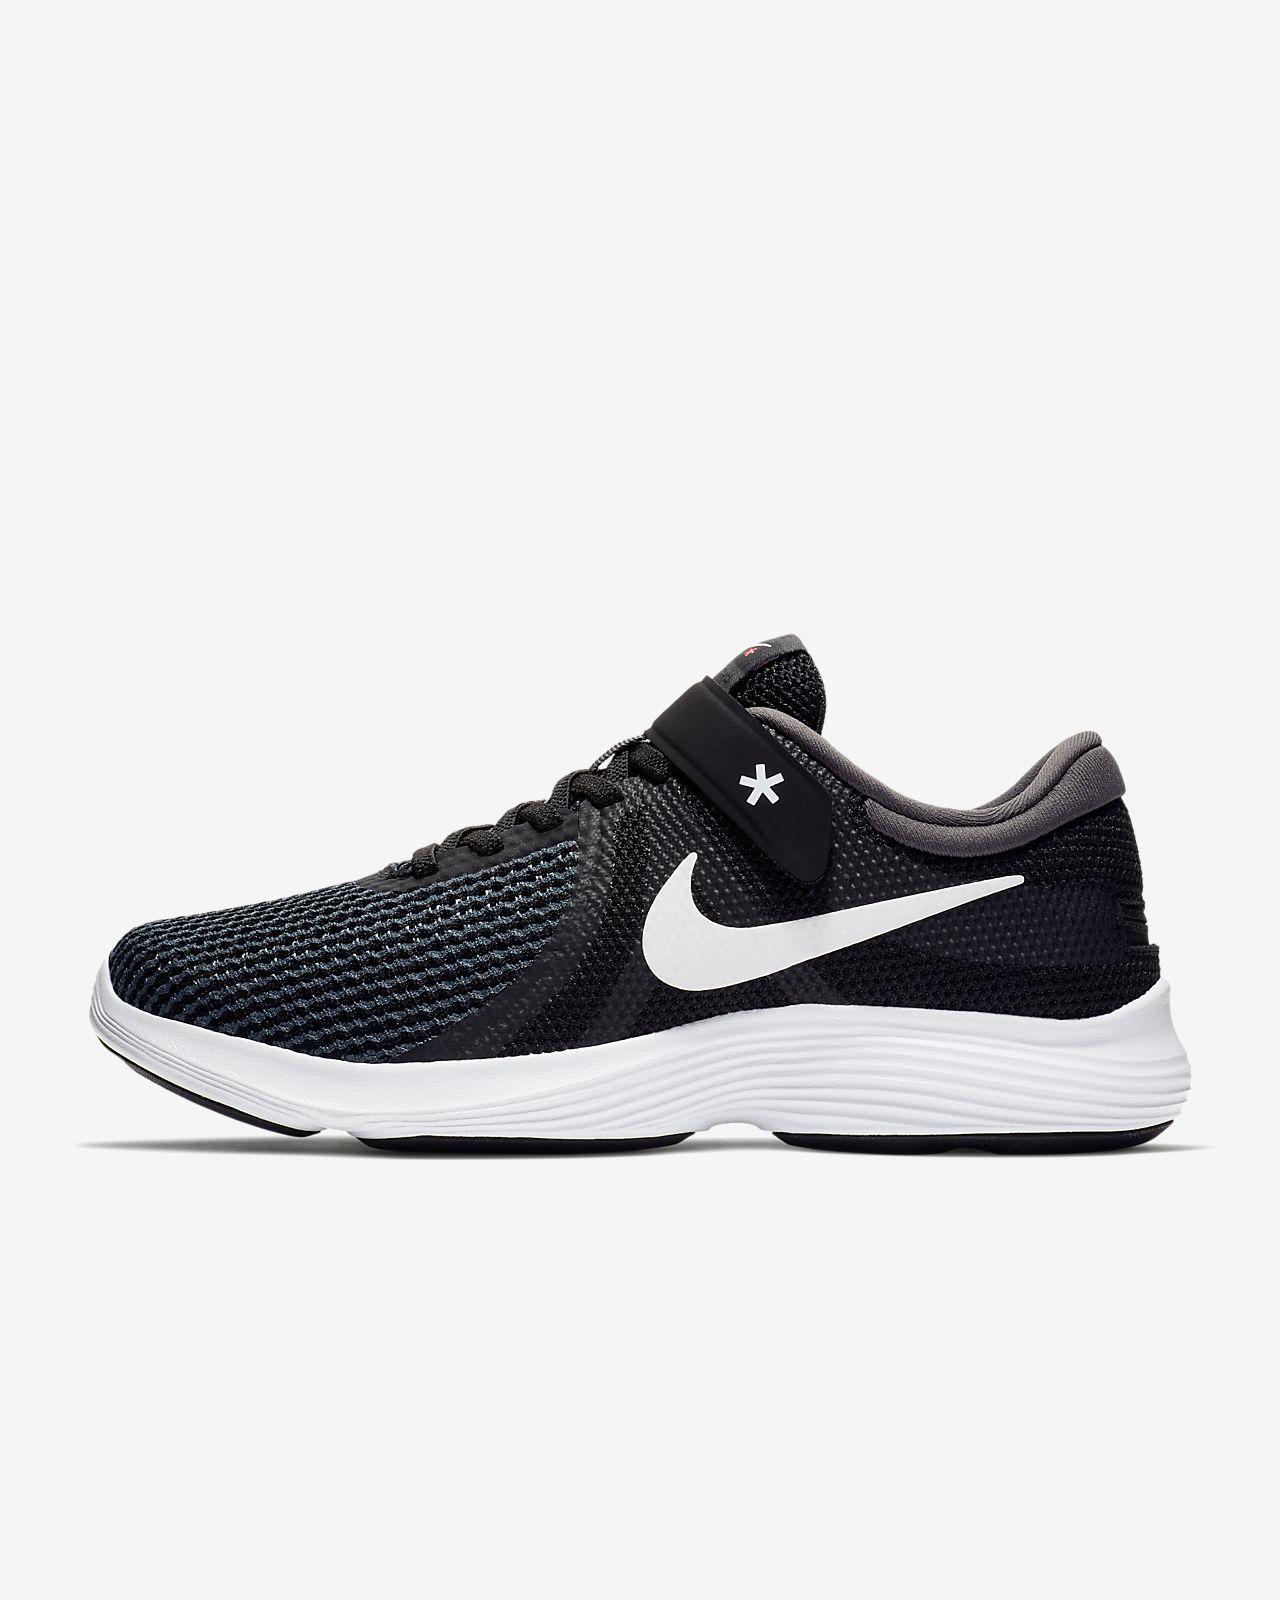 Chaussure de running Nike Revolution 4 FlyEase pour Femme